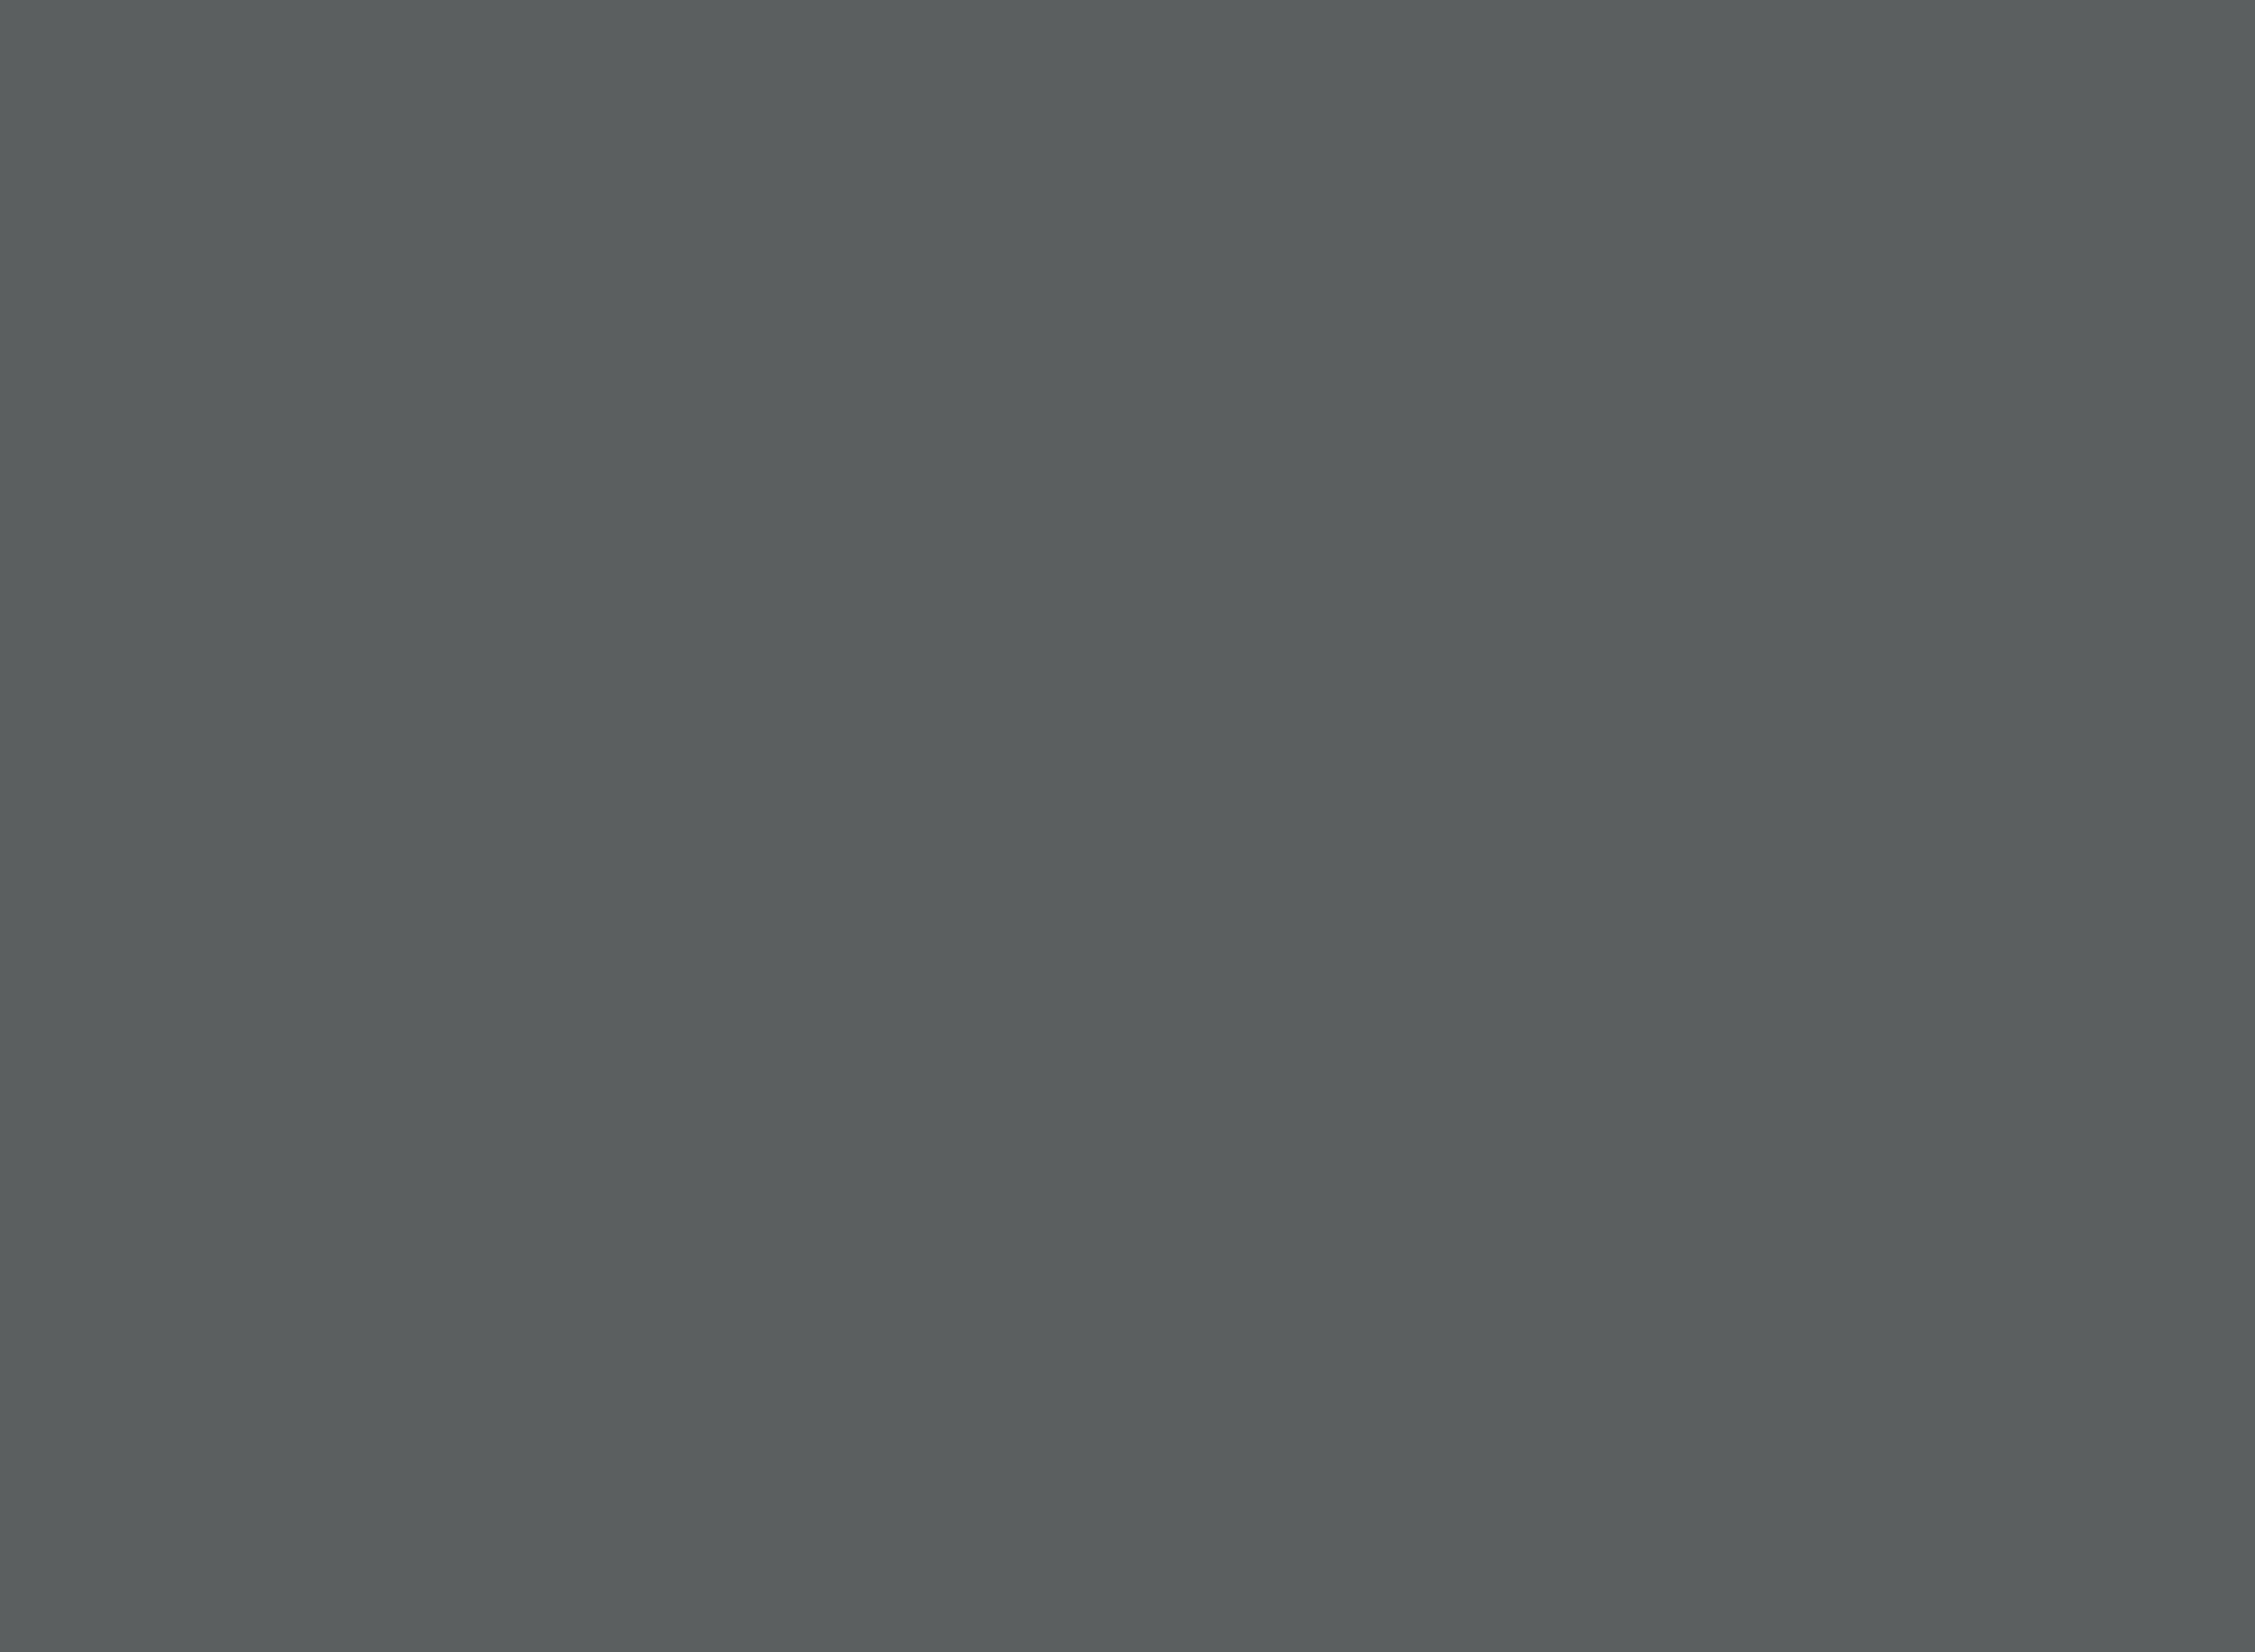 PGSM, Grau Sprenkel mét. ACHTUNG nicht abbildbar, 2farbig